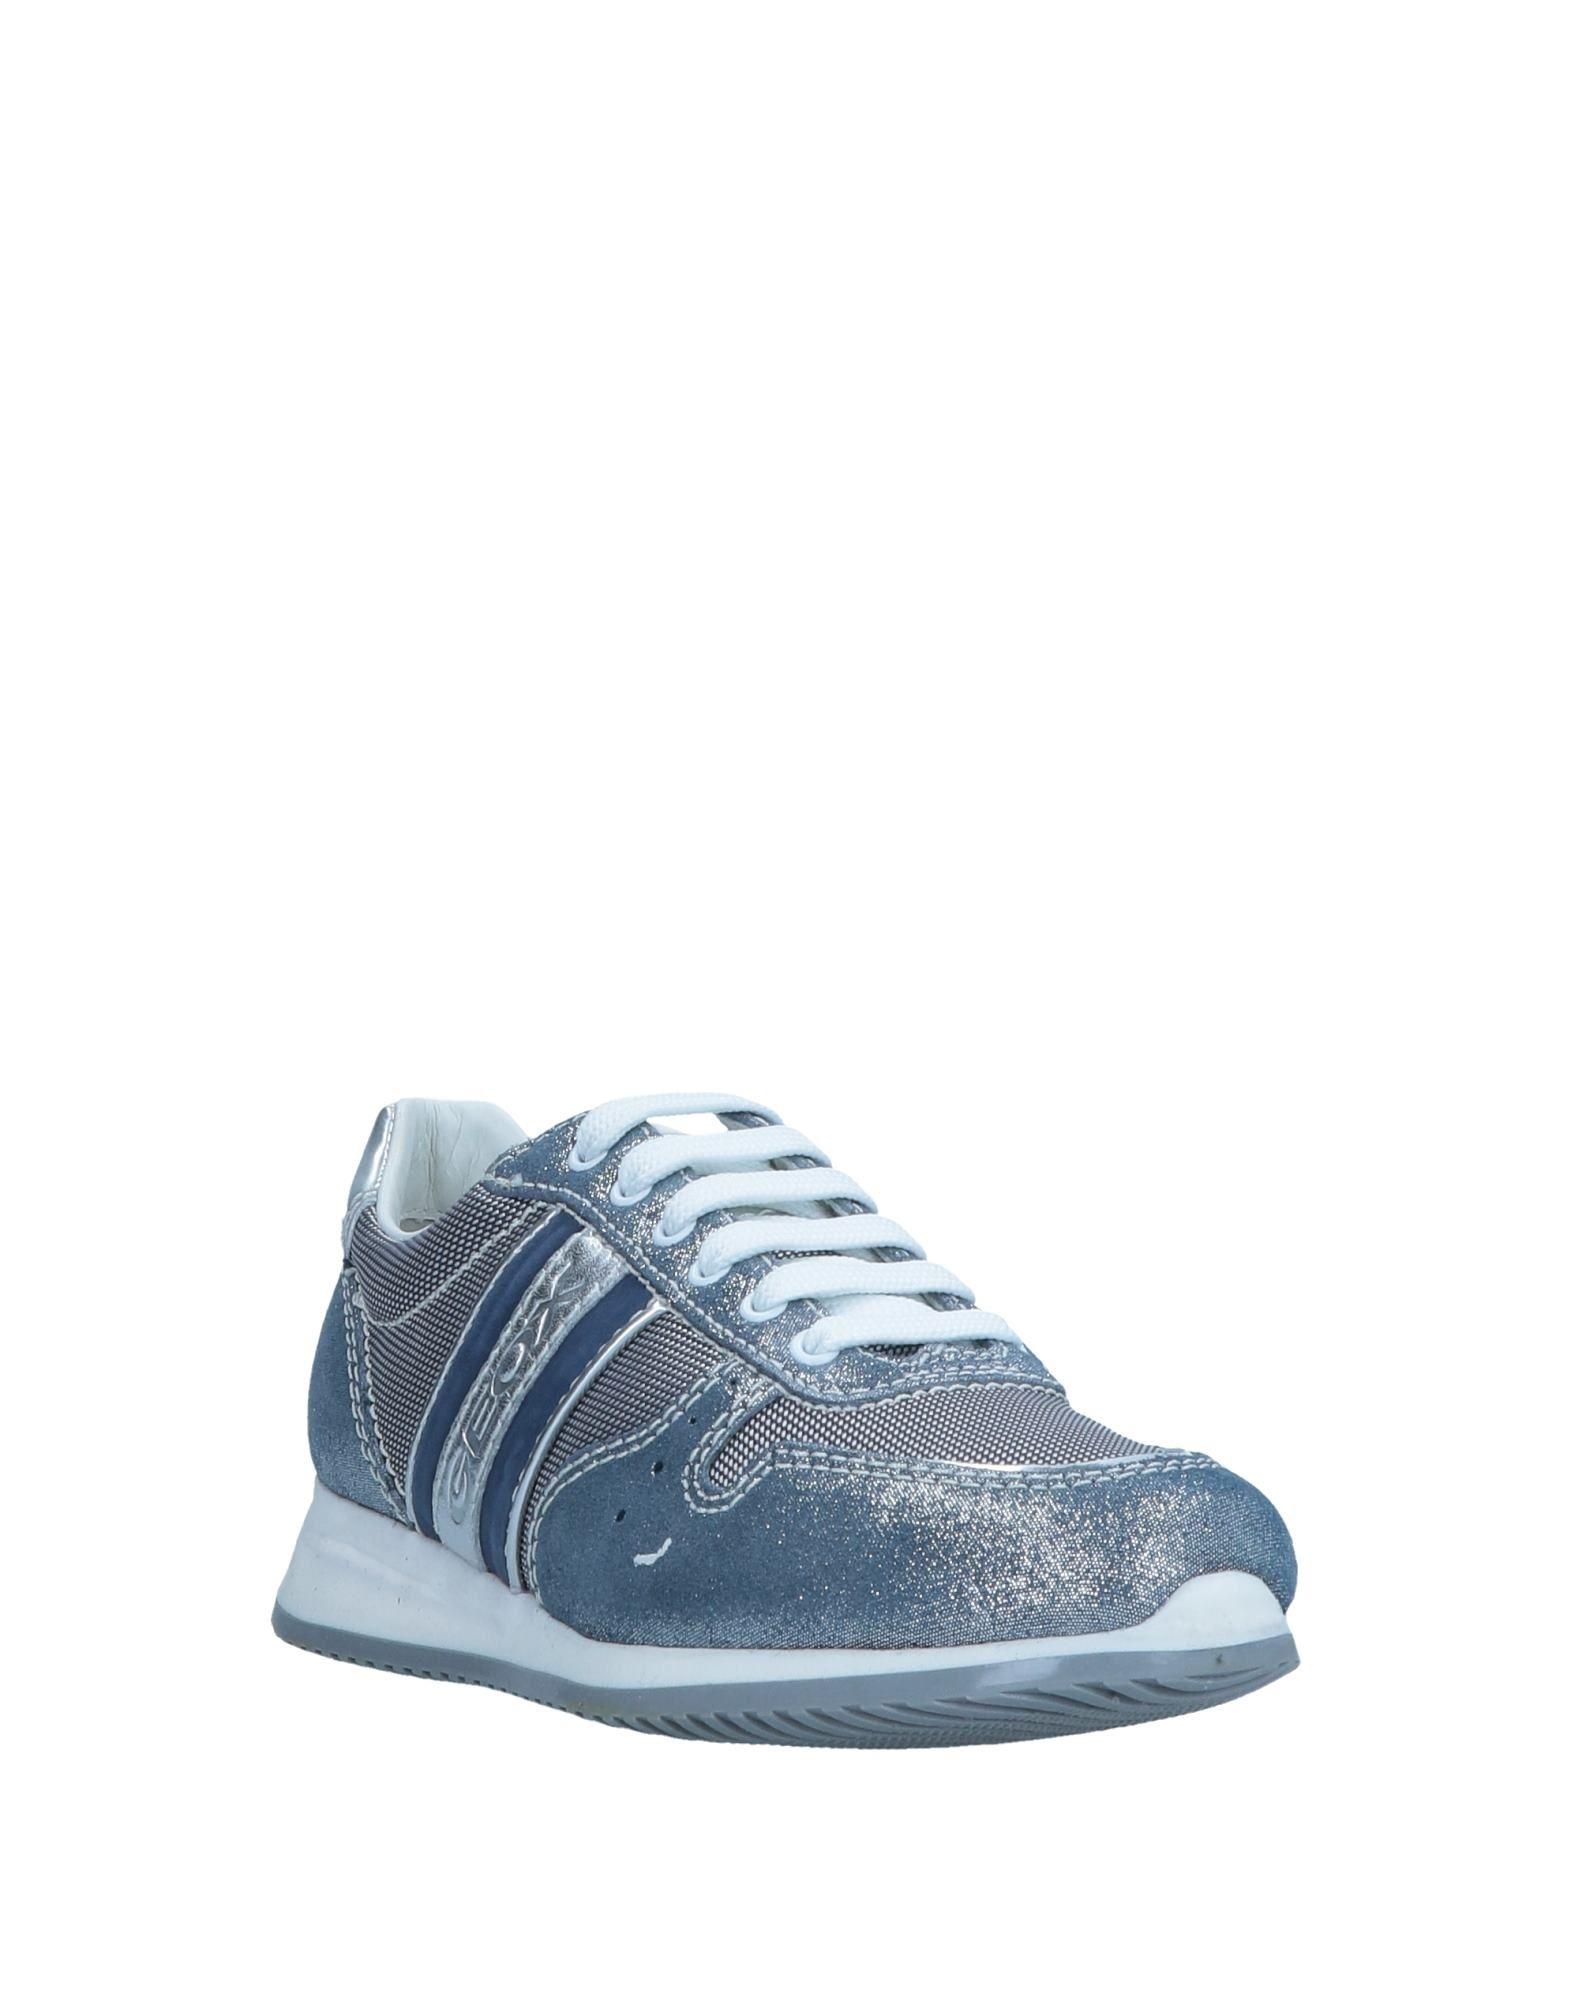 Geox Gute Sneakers Damen  11549785JB Gute Geox Qualität beliebte Schuhe bf6b23